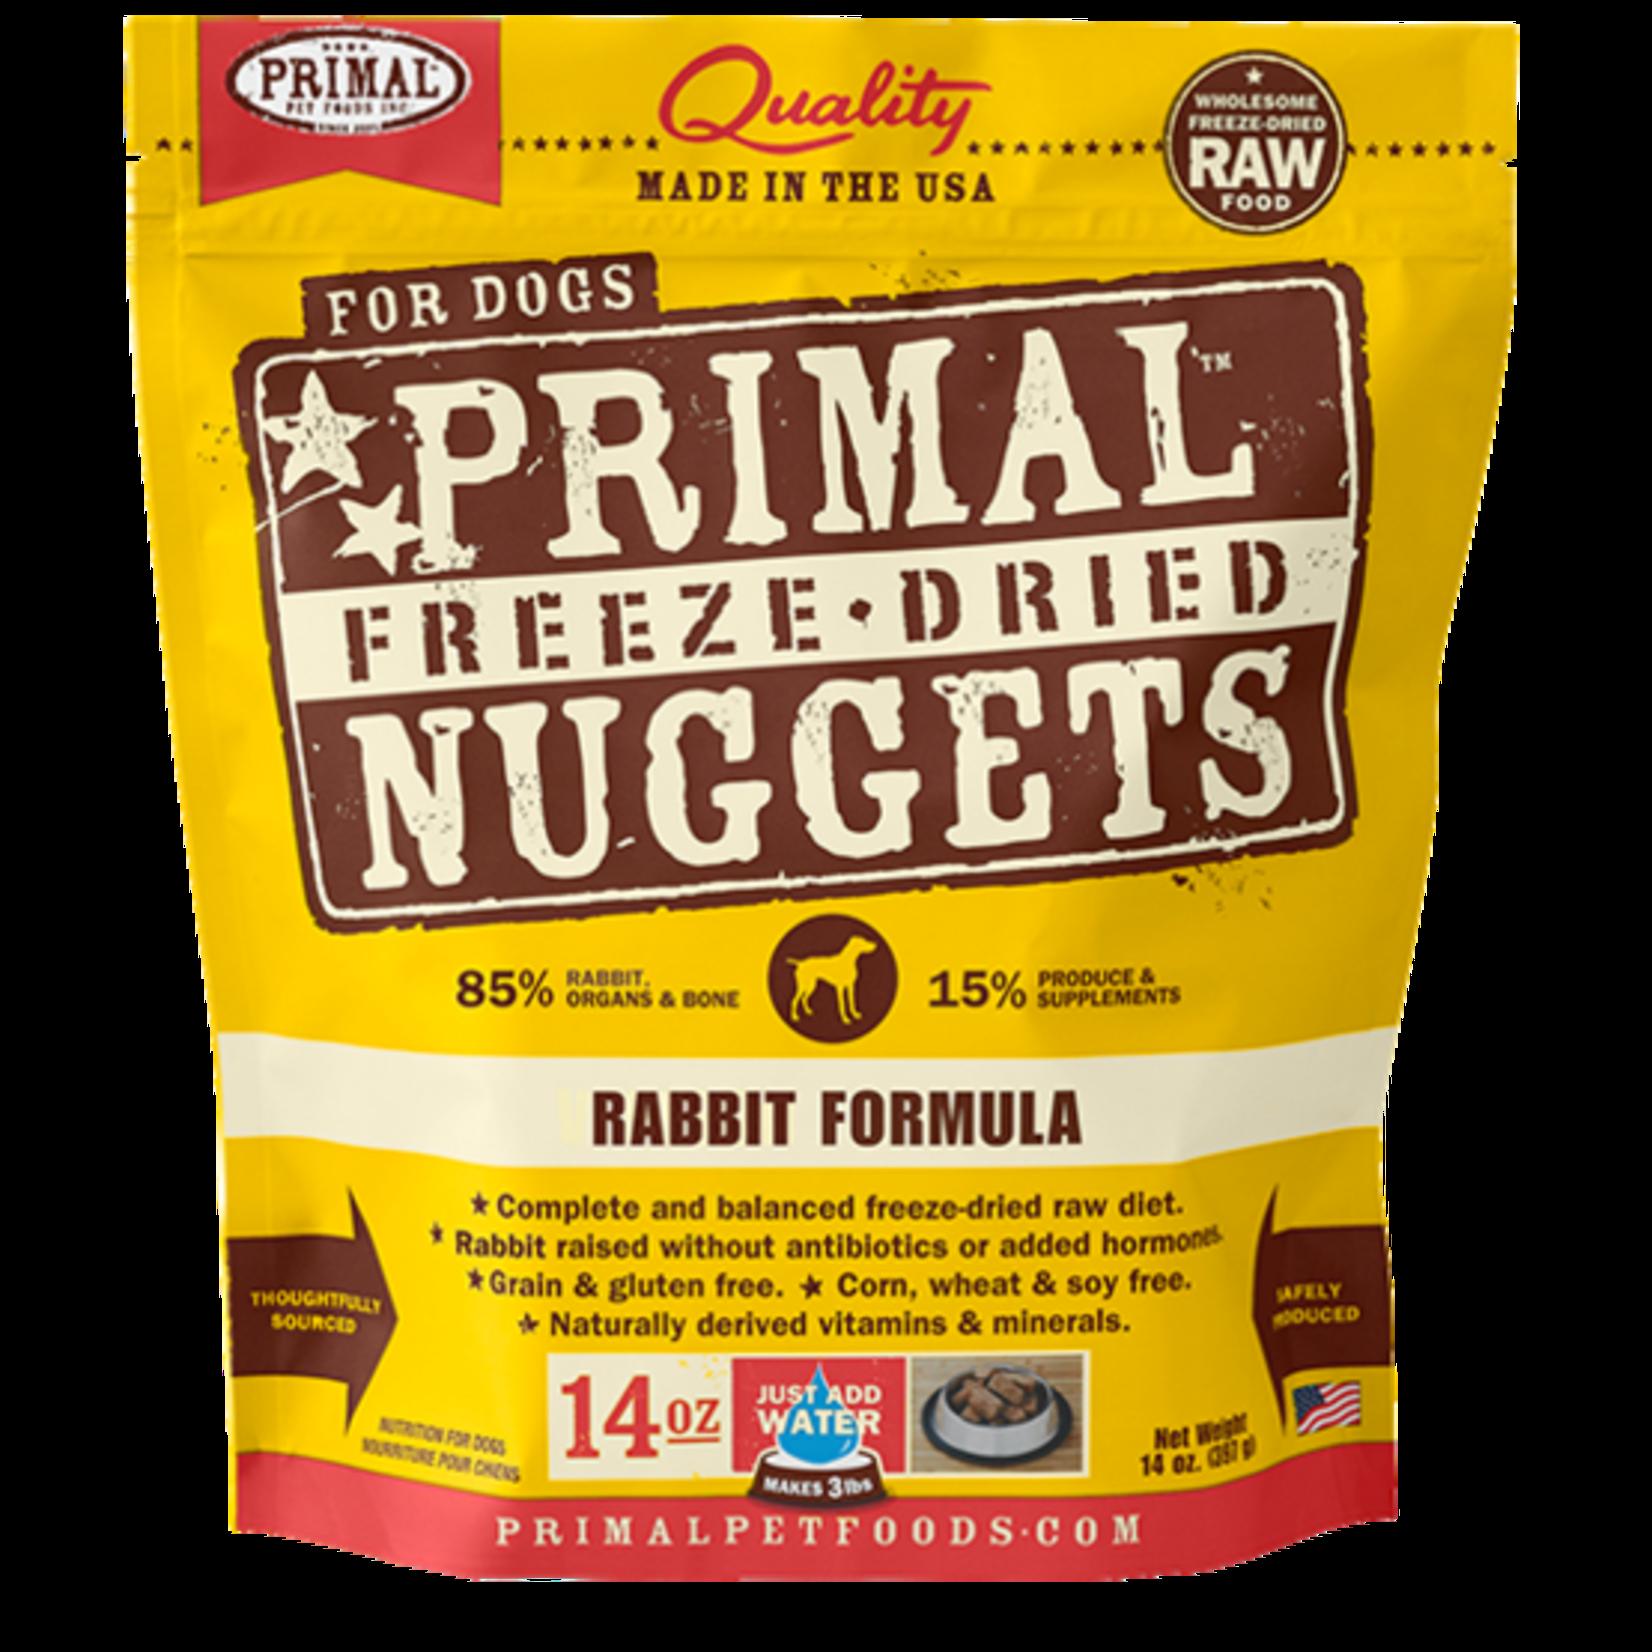 Primal Pet Foods Primal Dog Freeze-dried Rabbit Nuggets 14 OZ